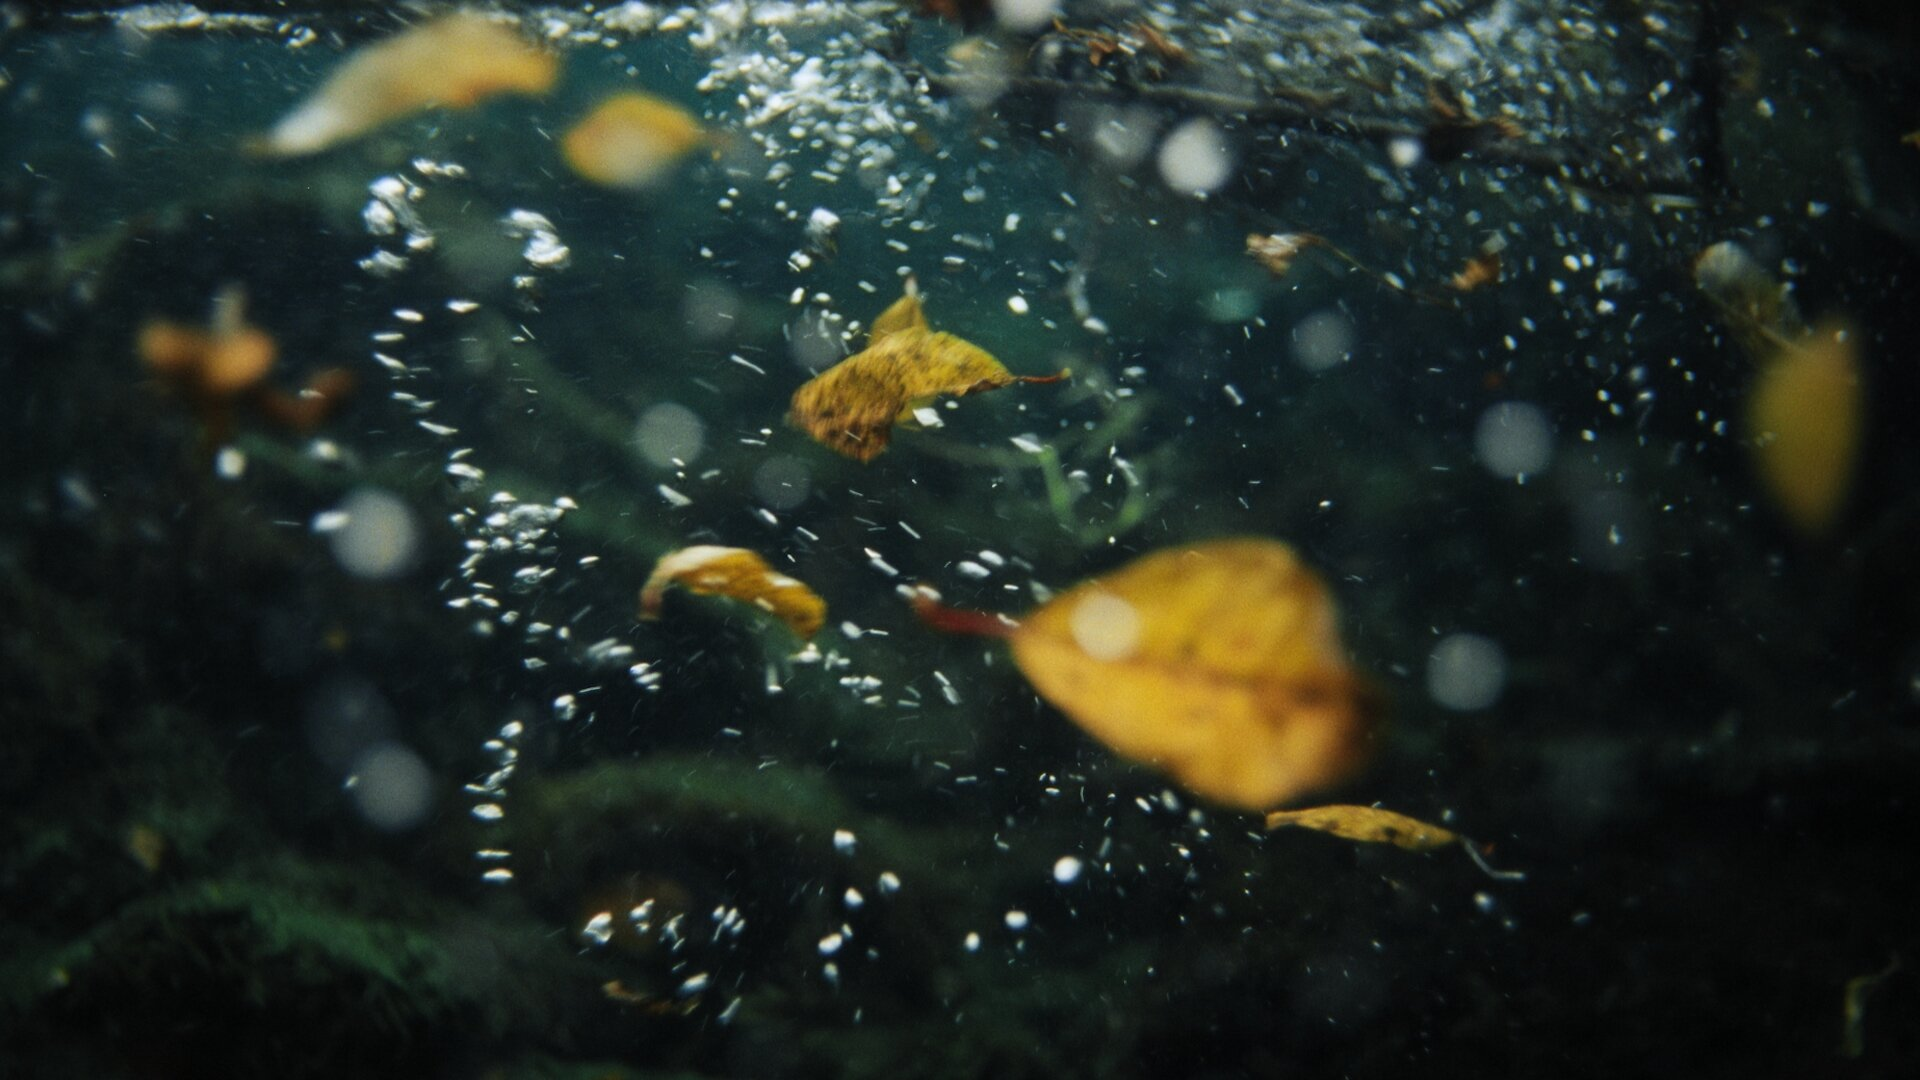 Rising Water_1.1.43.jpg